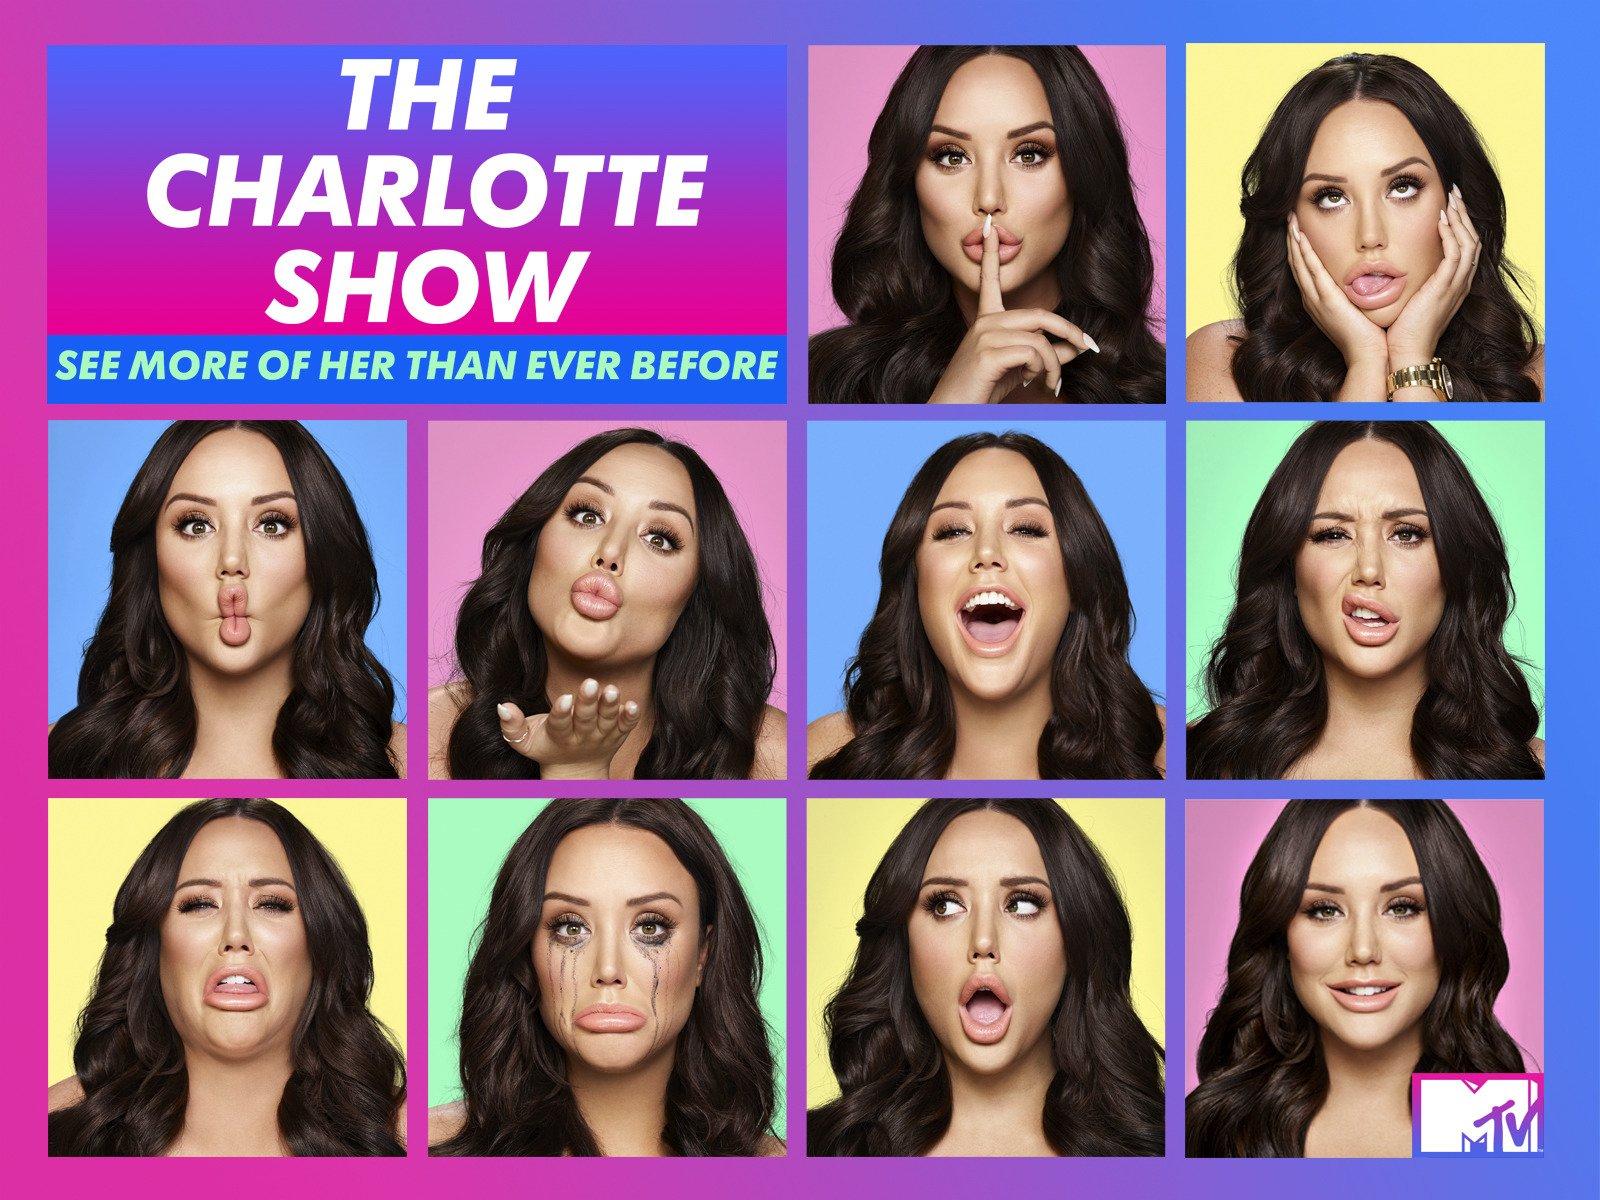 The Charlotte Show - Season 1